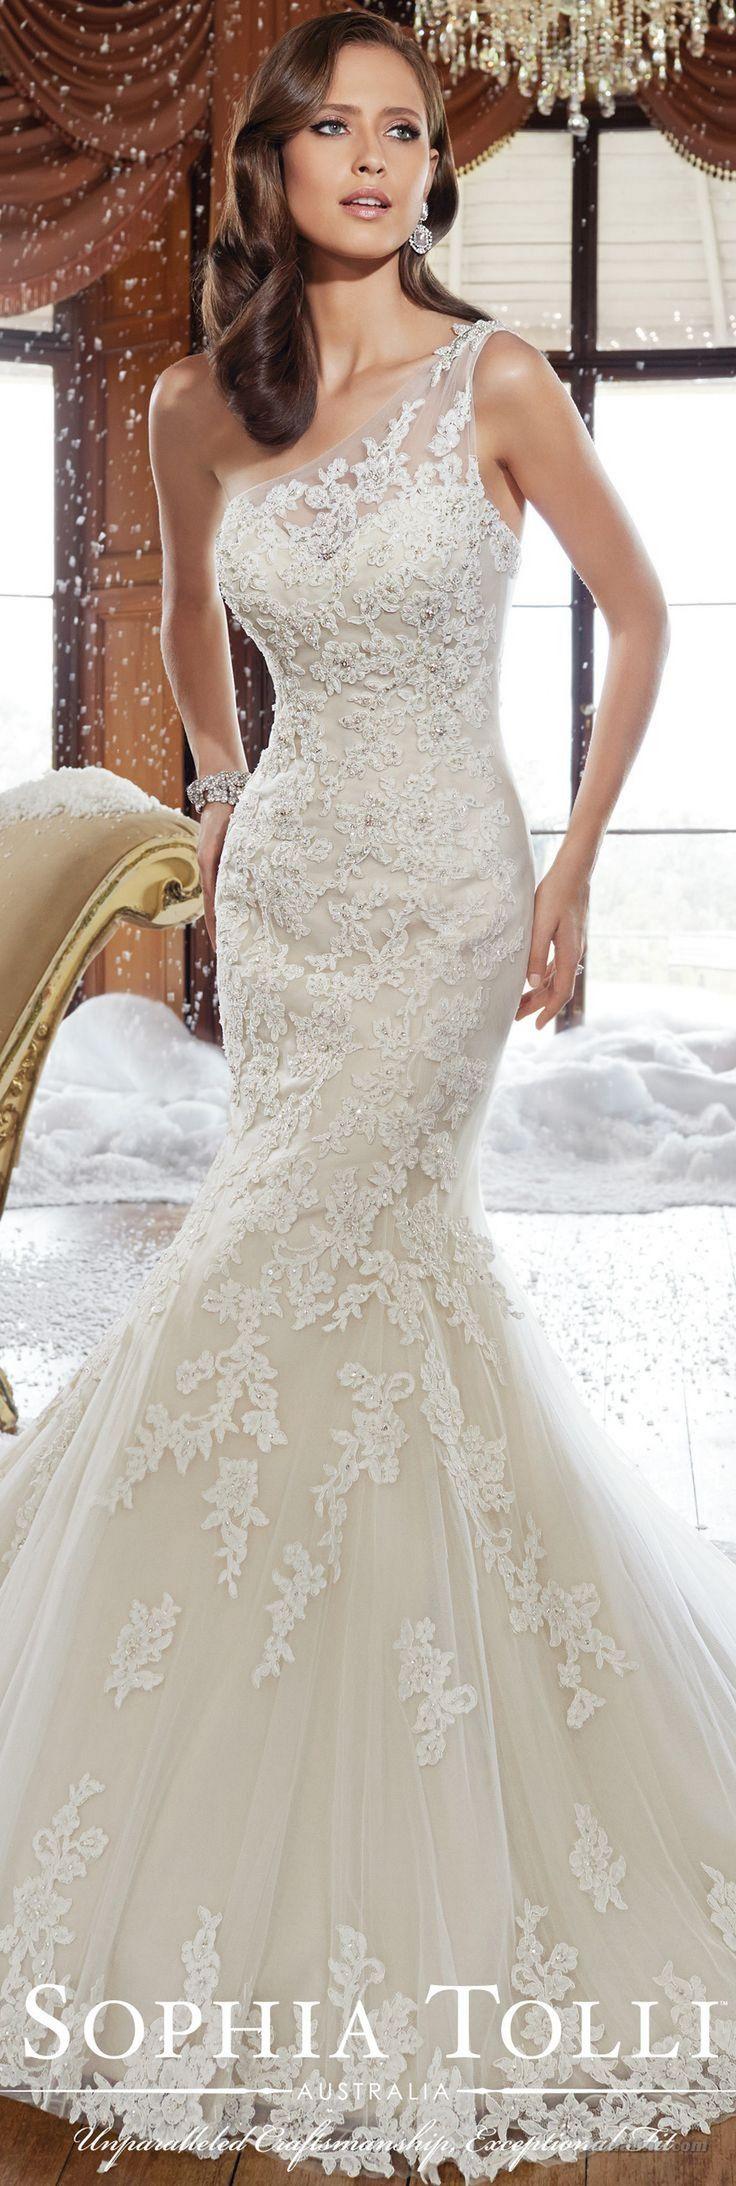 Best 25 one shoulder wedding dress ideas on pinterest for One shoulder wedding dress